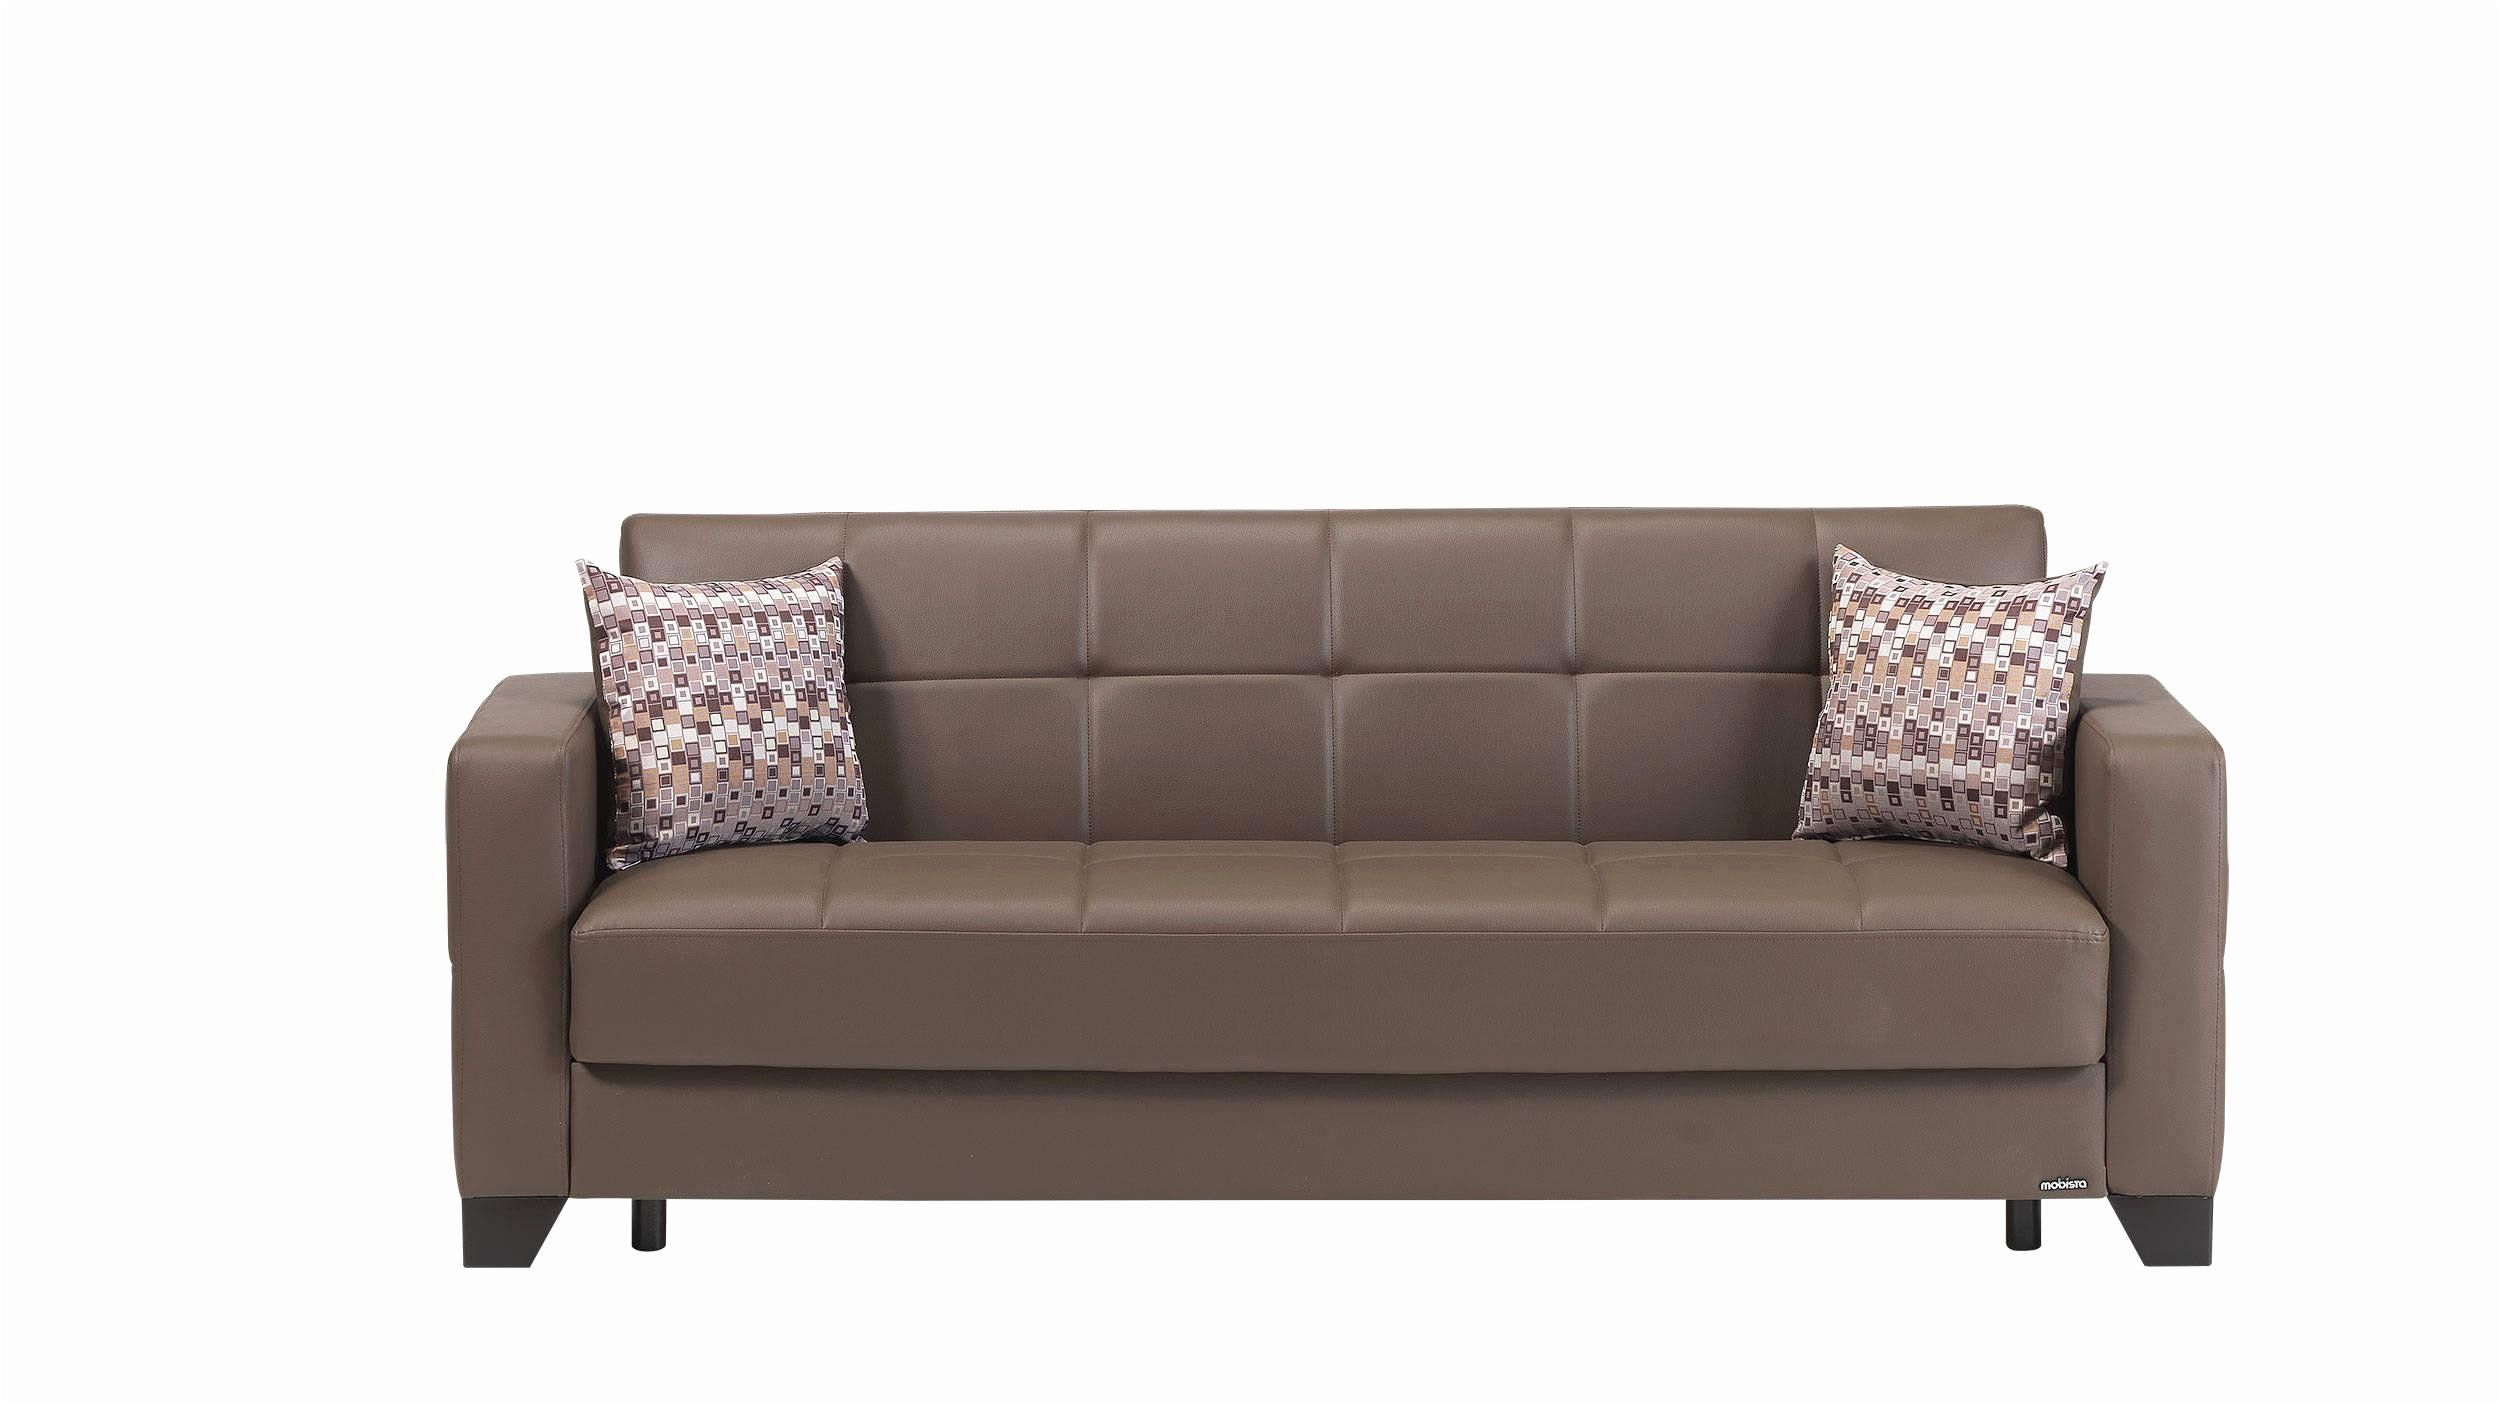 Kolonialstil Sofa Einzigartig Big Sofa Leder Schones Big Sofa Xxl Couch Ebay Kleinanzeigen Mobil Sofa L Minimalis